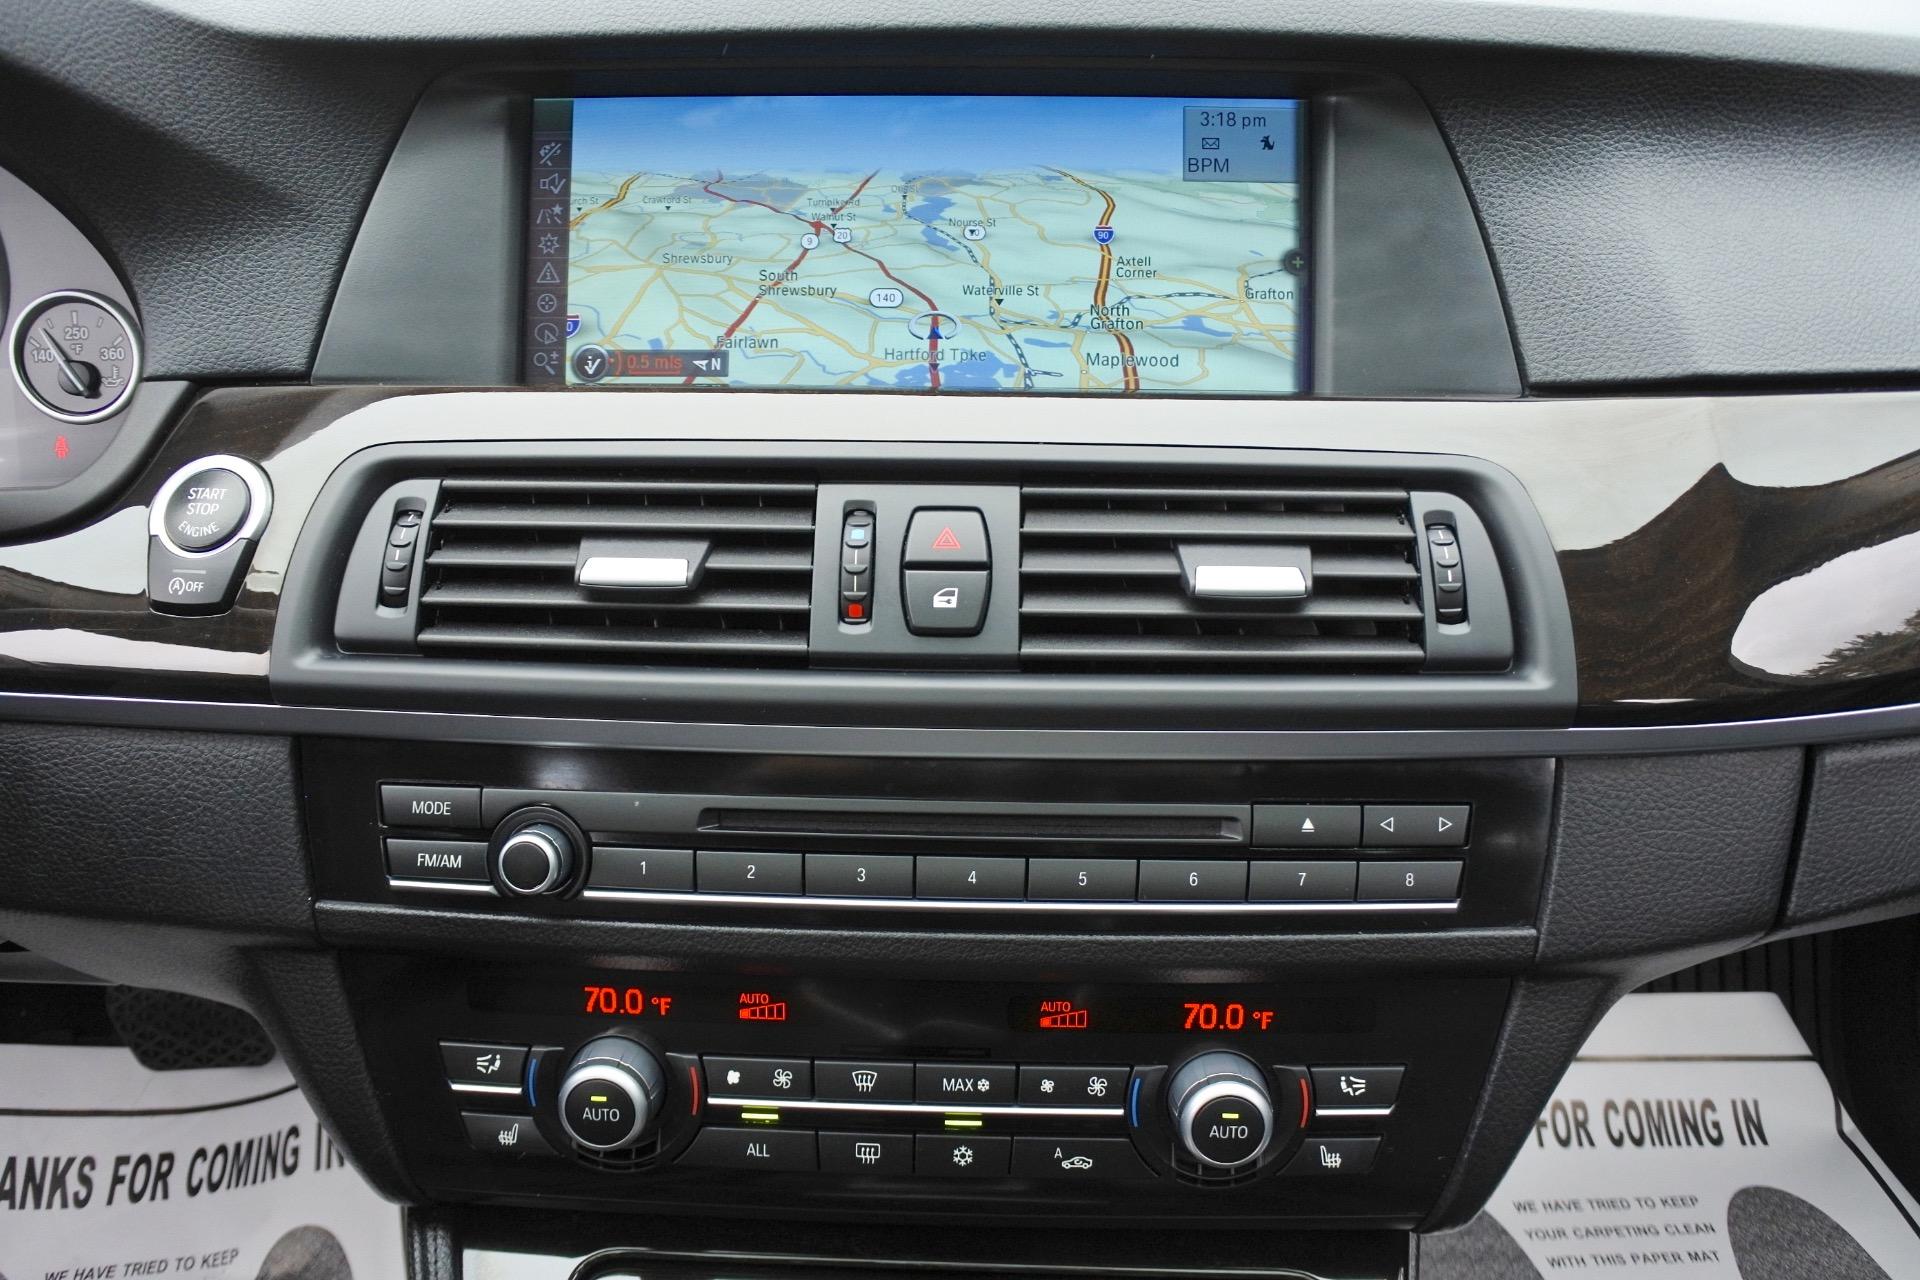 Used 2012 BMW 5 Series 528i xDrive AWD Used 2012 BMW 5 Series 528i xDrive AWD for sale  at Metro West Motorcars LLC in Shrewsbury MA 11